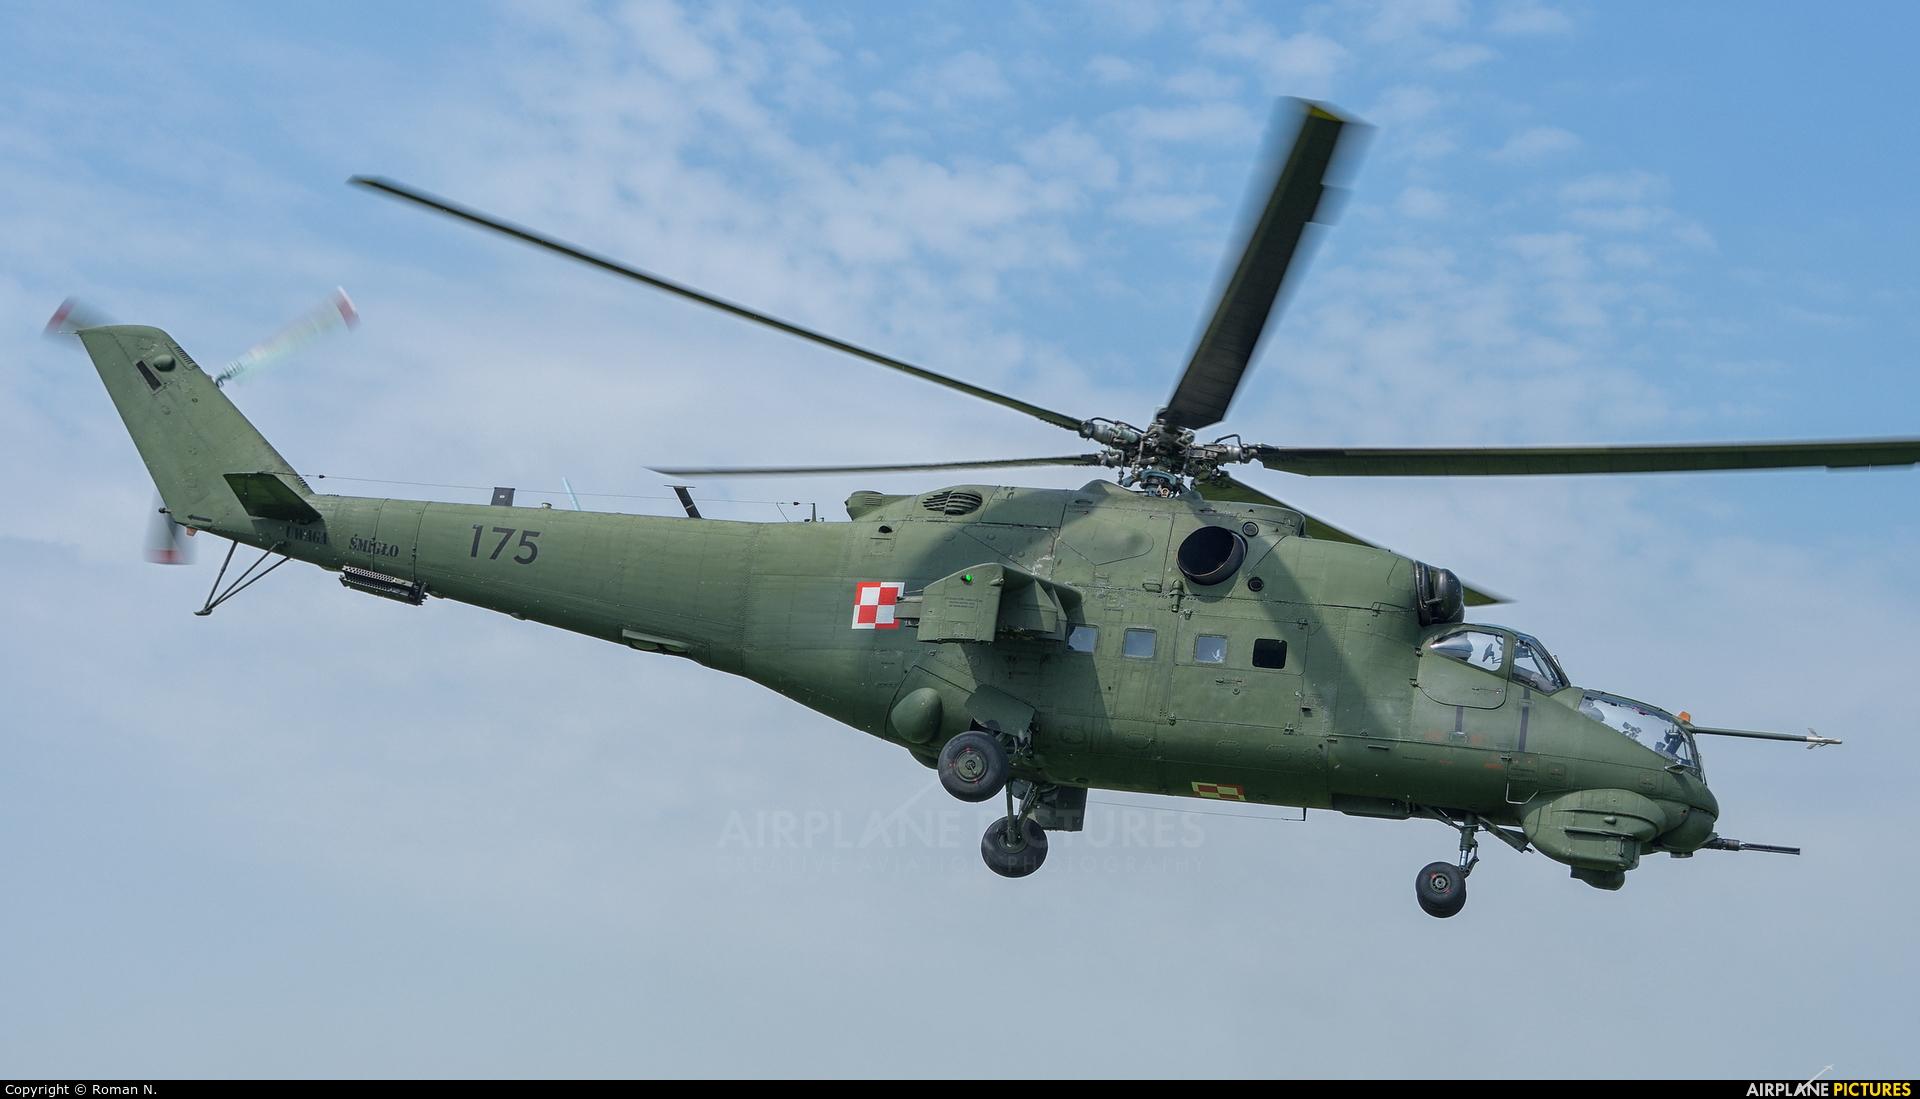 Poland - Army 175 aircraft at Inowrocław